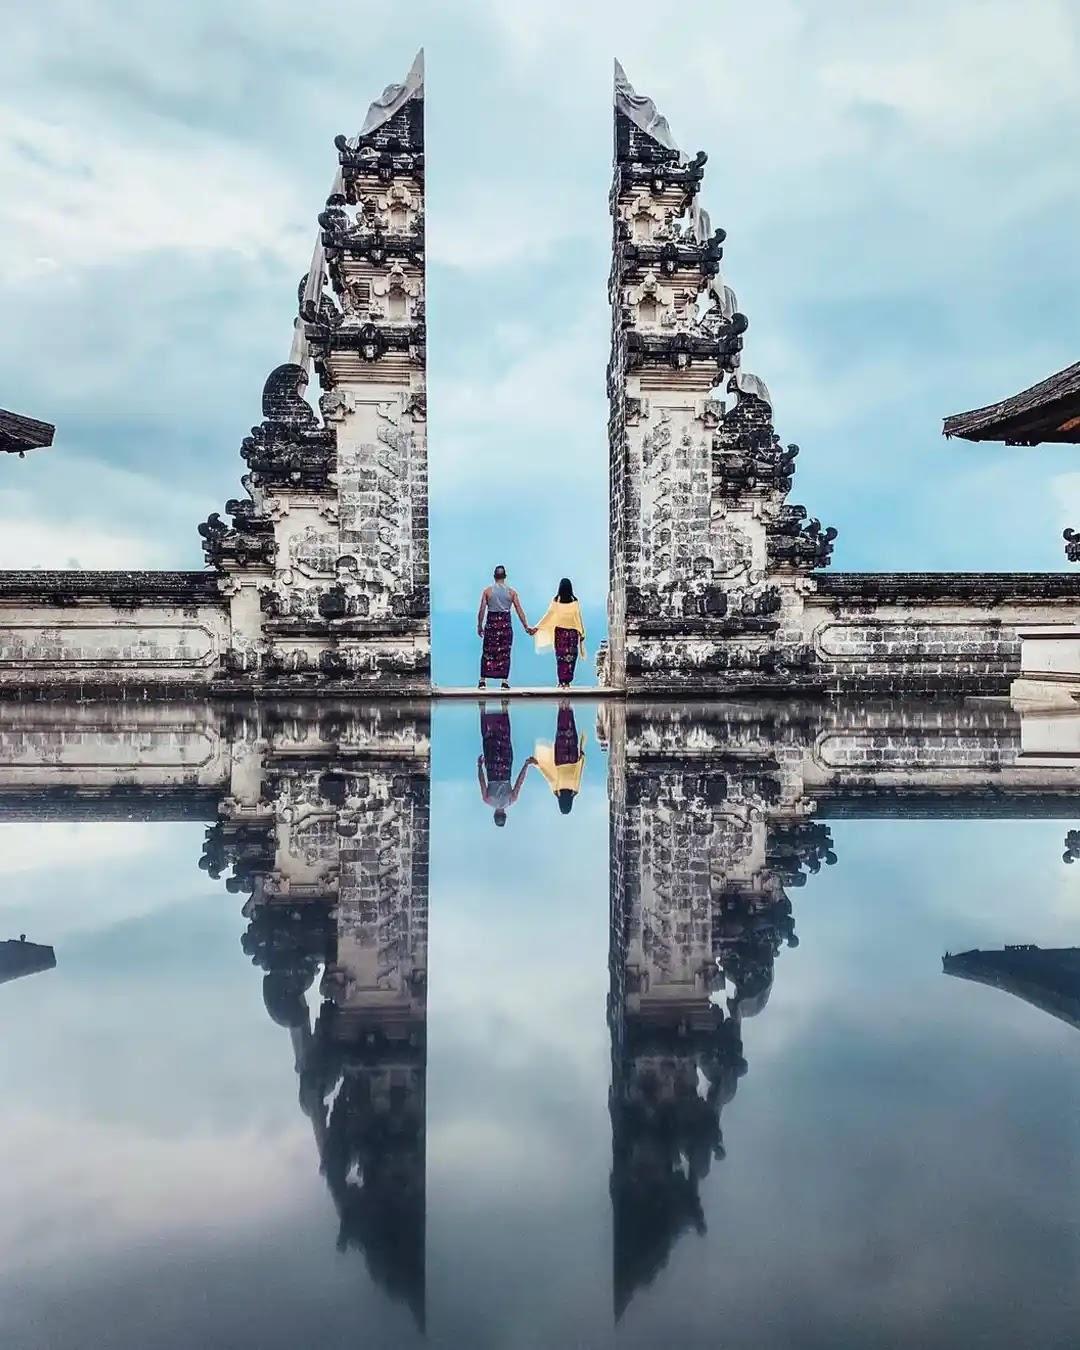 Foto Refleksi sempurna di gates of heaven Pura Lempuyang Bali - foto instagram @casssil